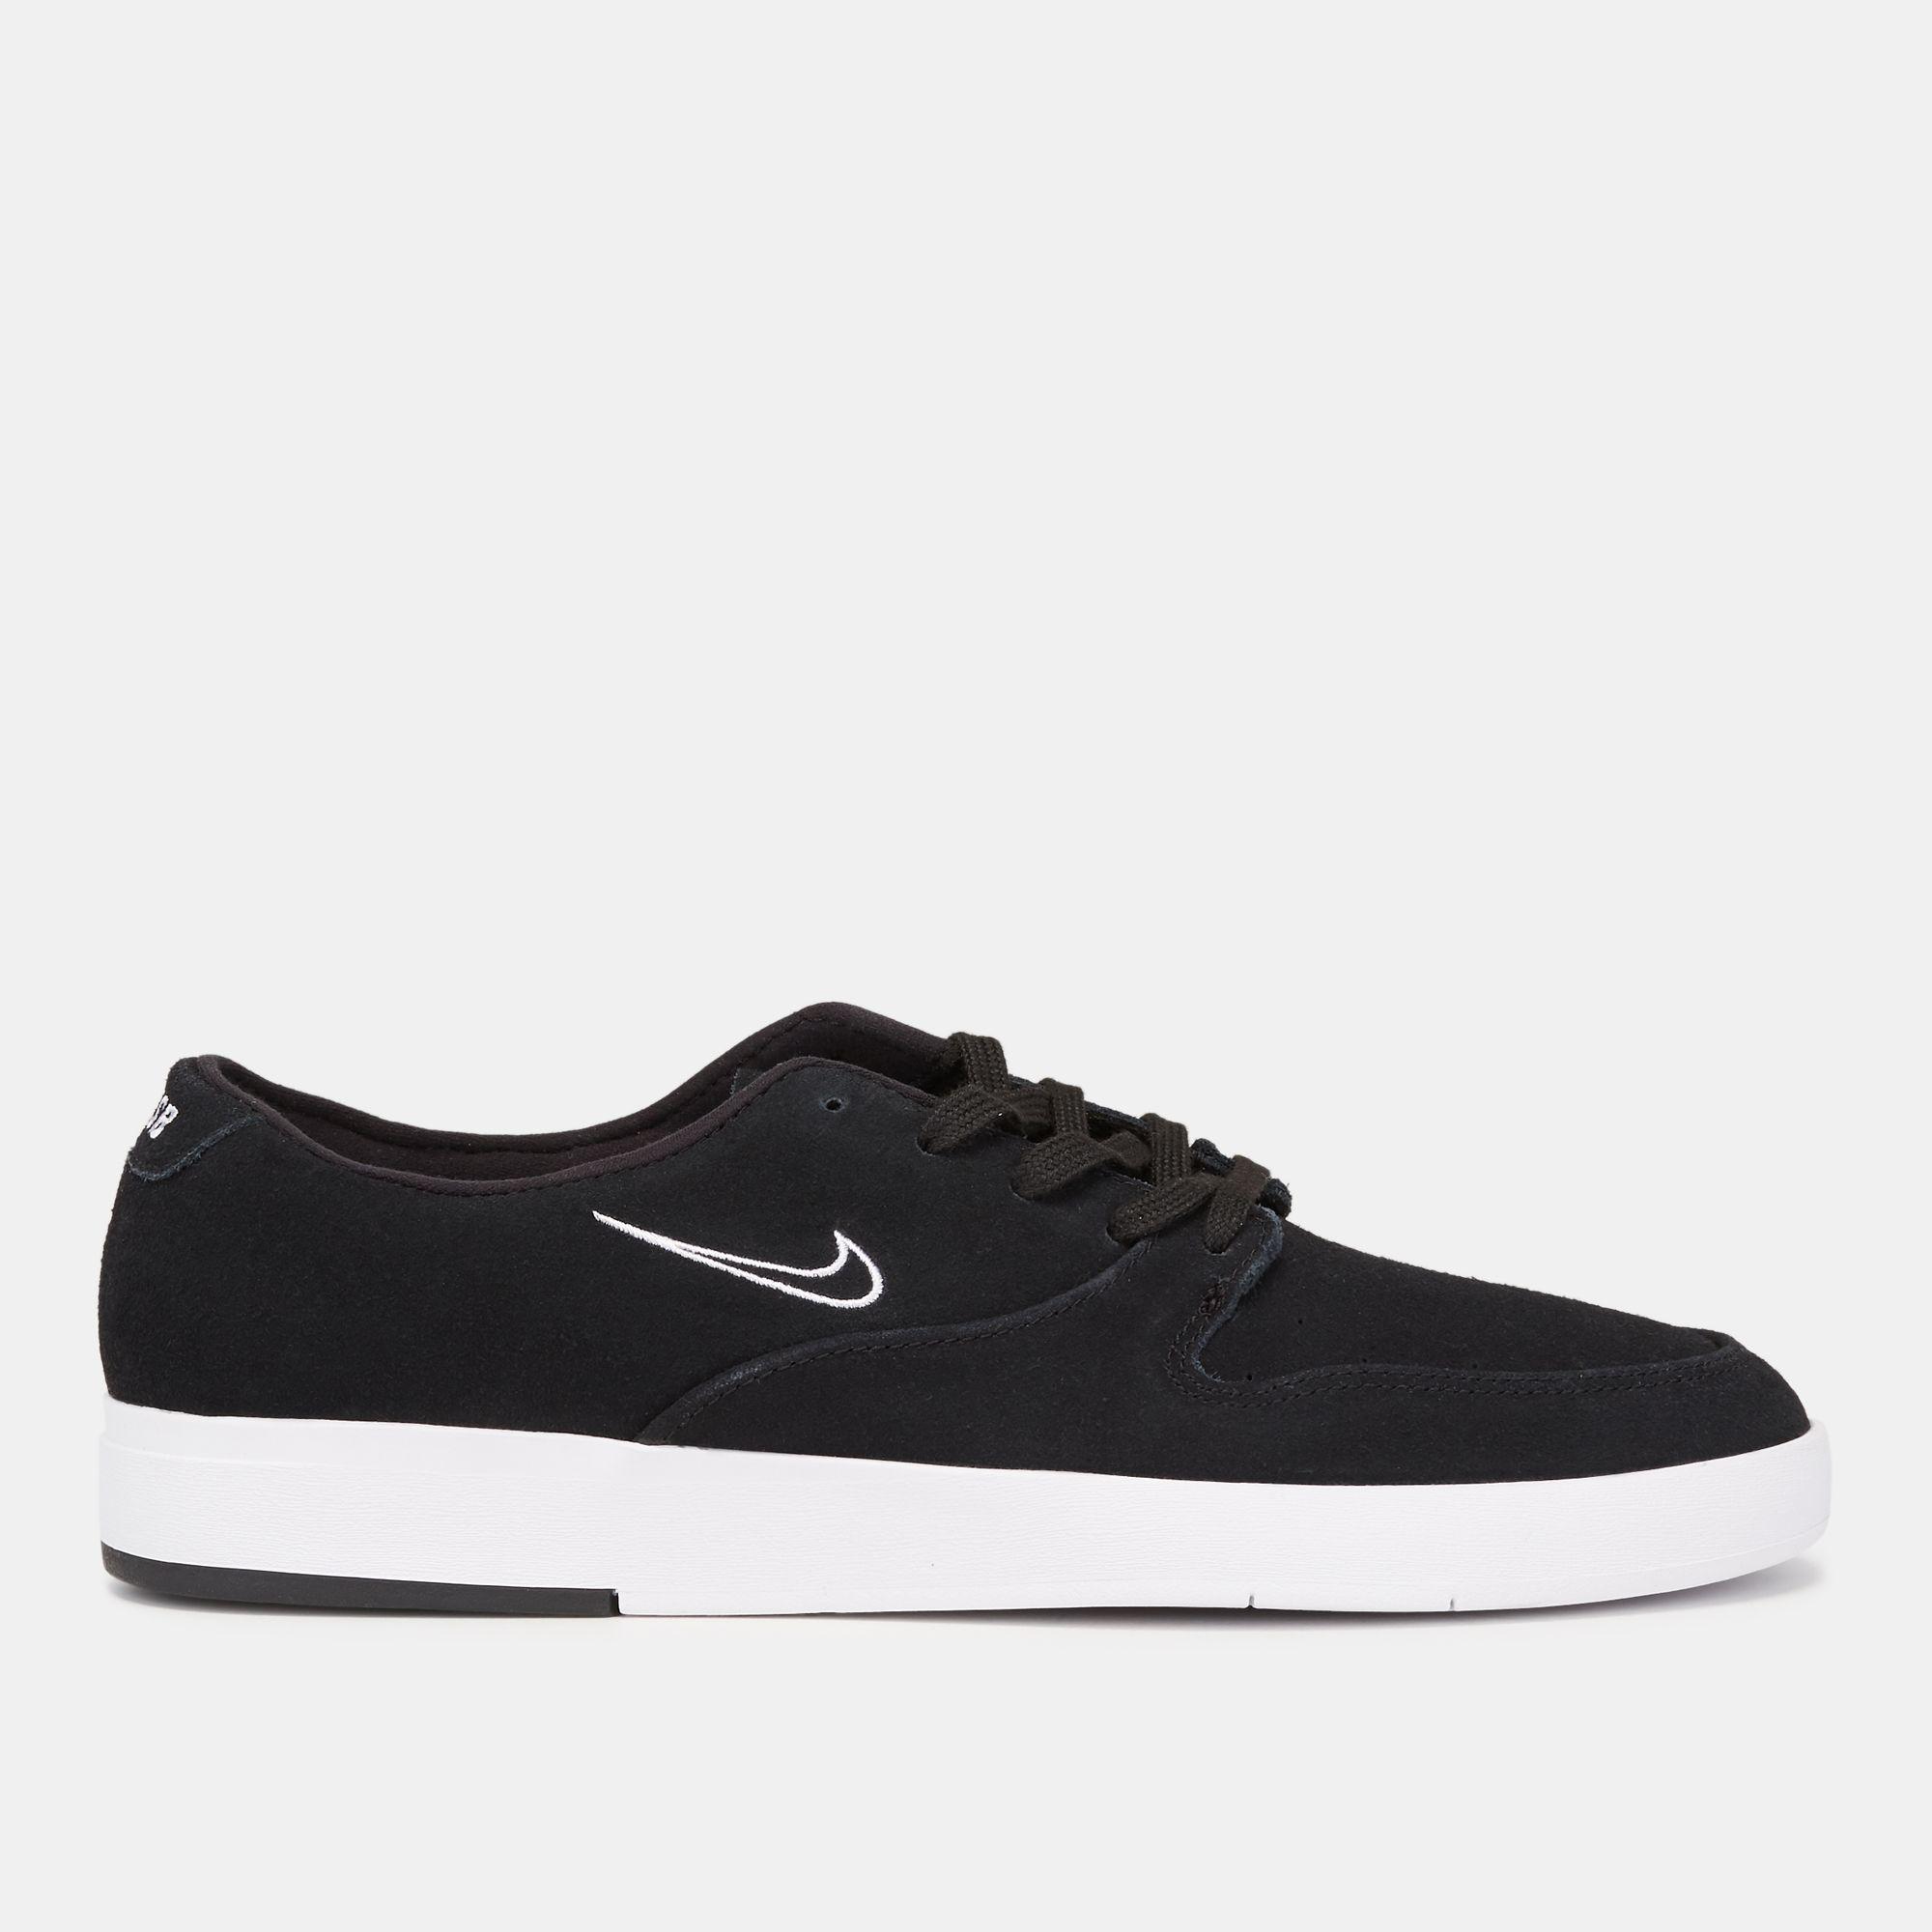 db6dfba4727a Nike SB Zoom Paul Rodriguez Shoe